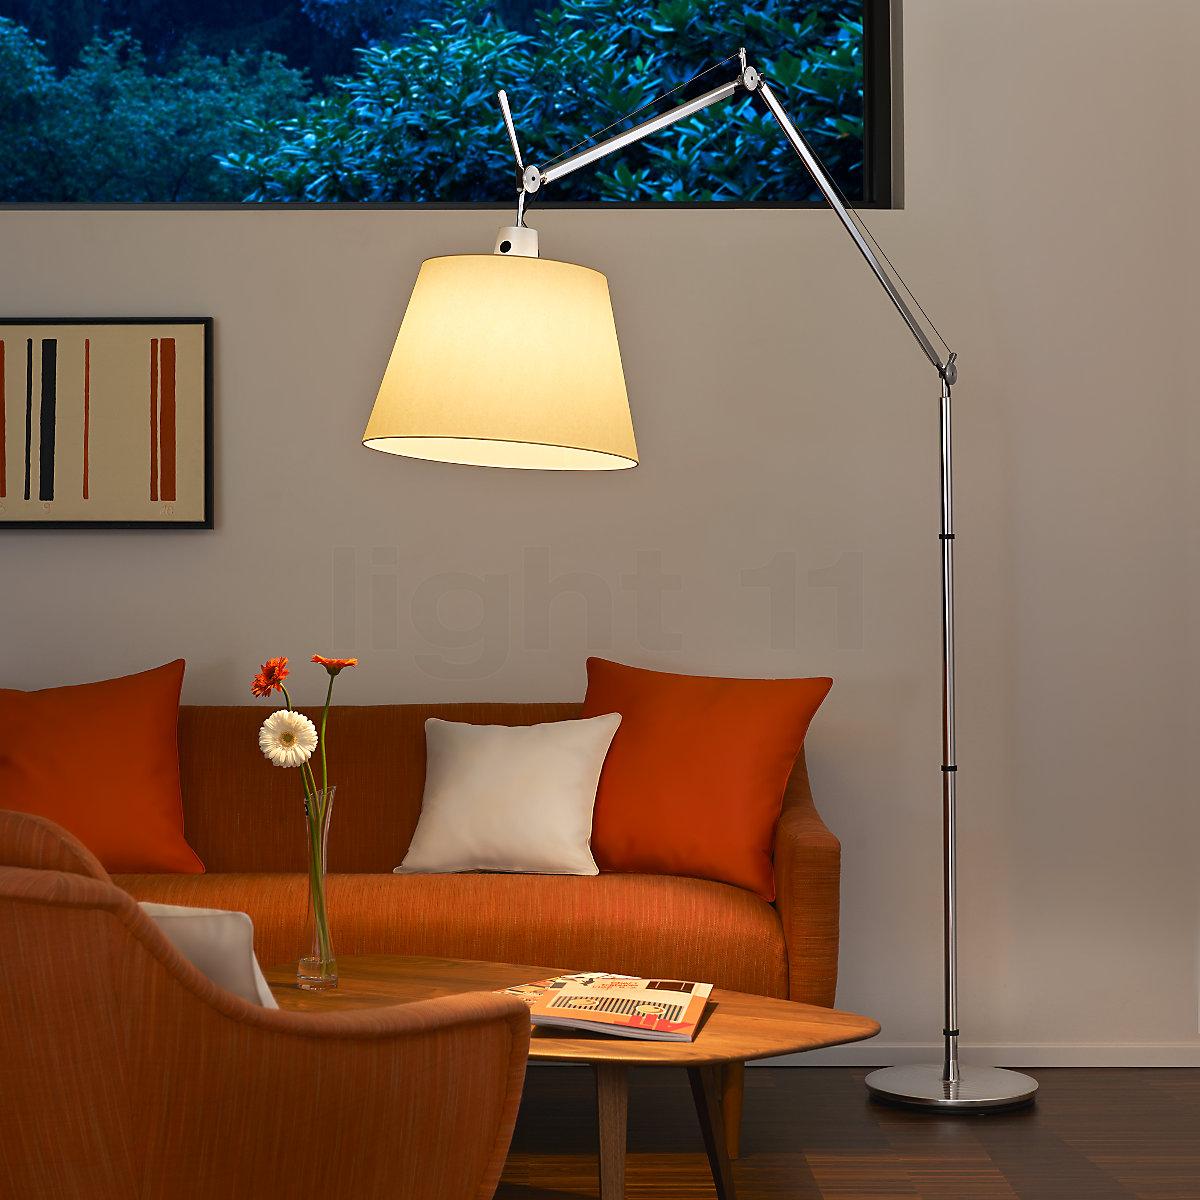 Artemide Tolomeo Mega Terra Mit Dimmer Kaufen Bei Light11 De